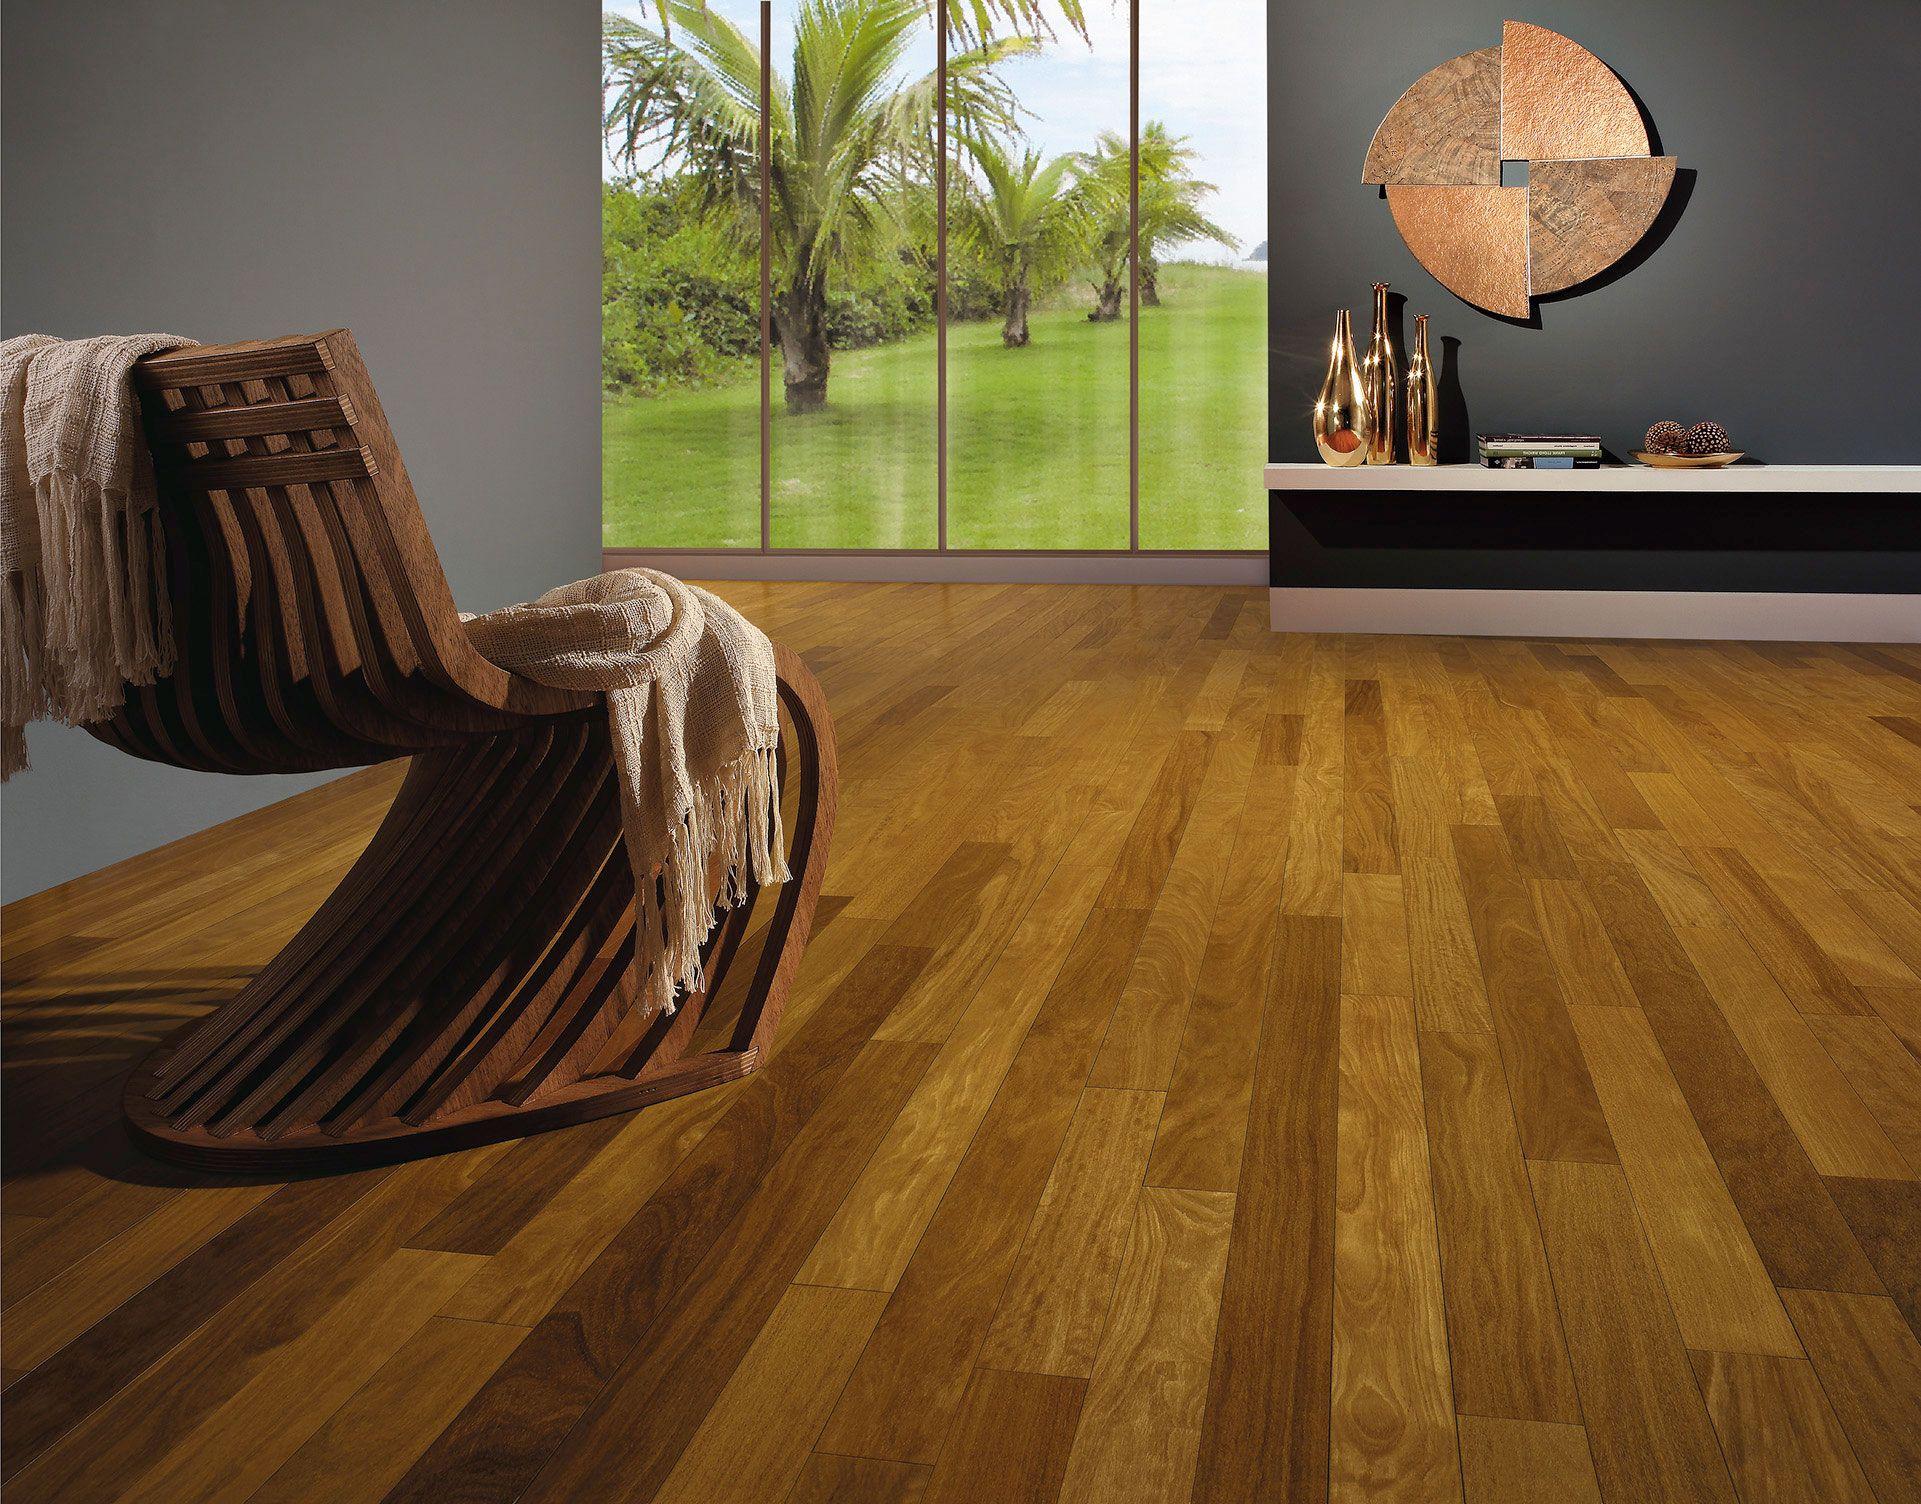 Looking For Solid Wood Flooring Dubai Woodenflooring Ae Provides